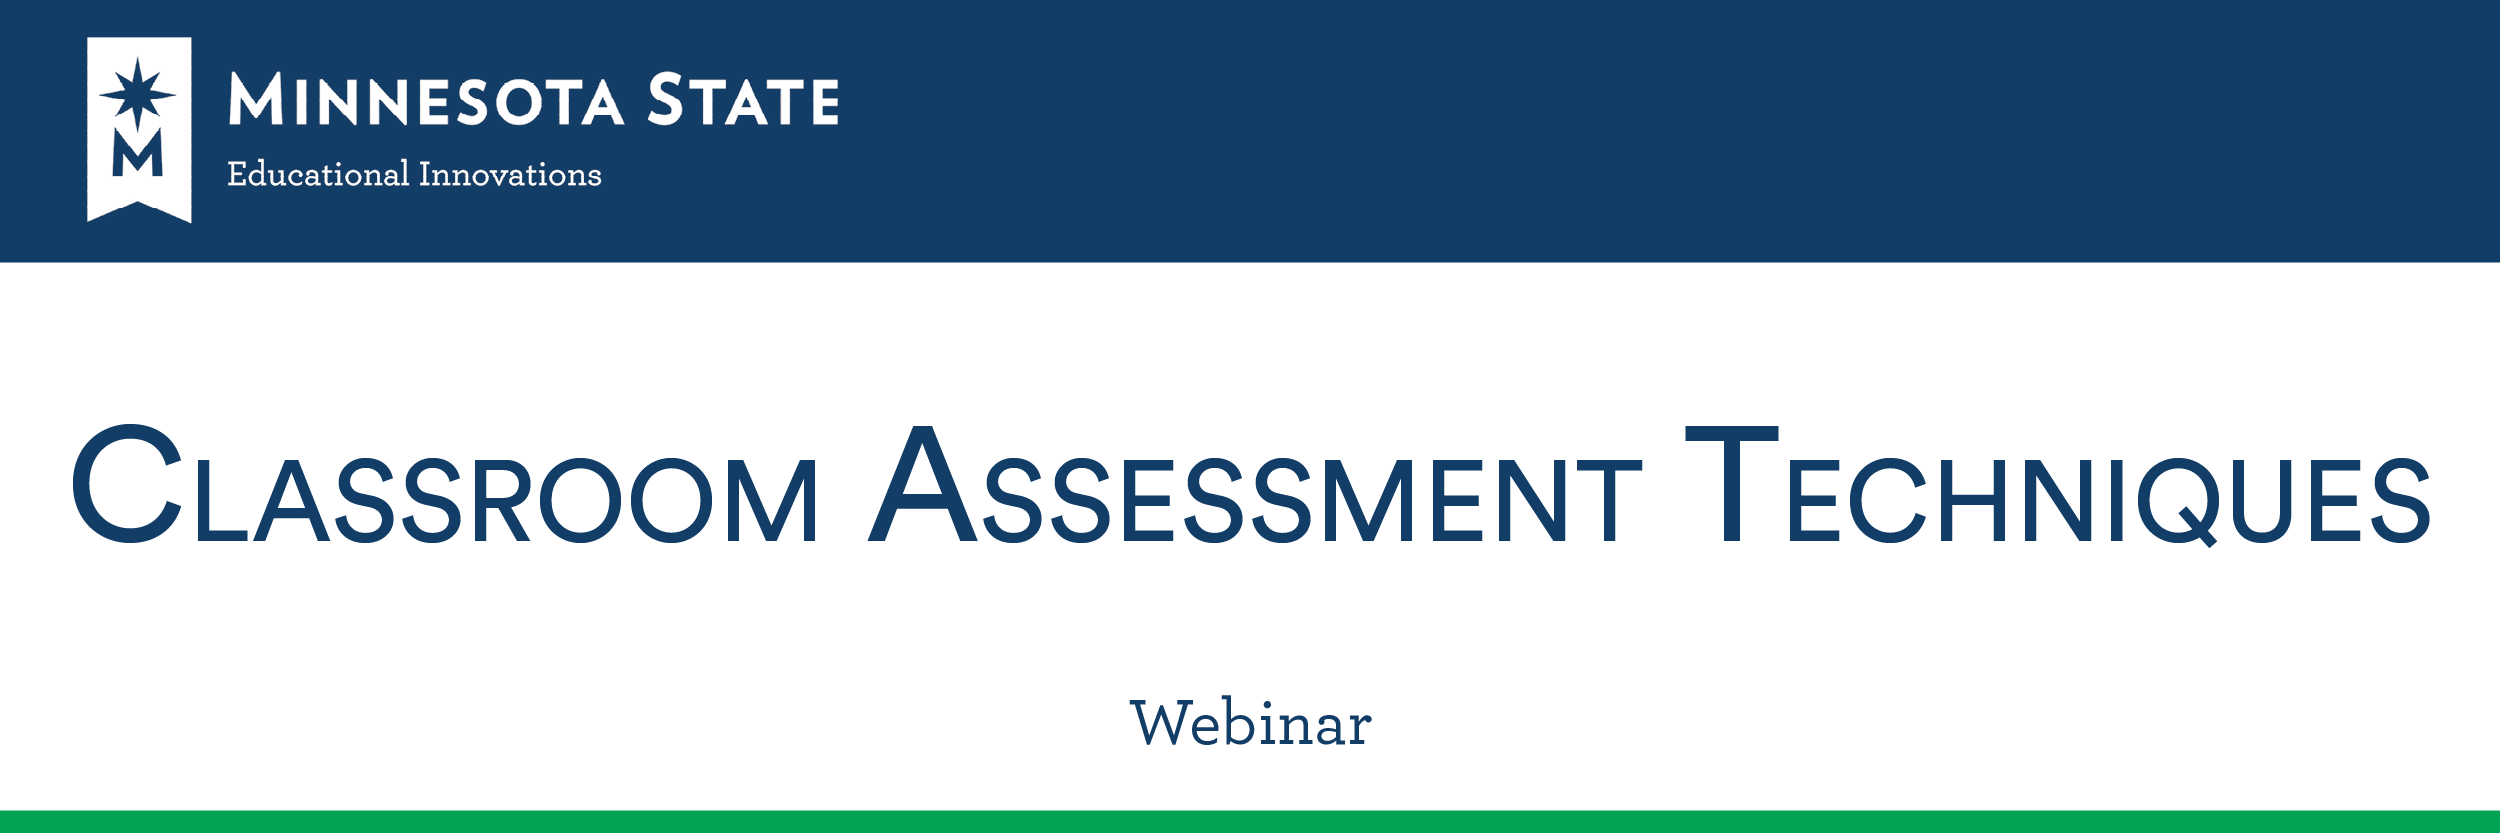 classroom-assessment-techniques-banner